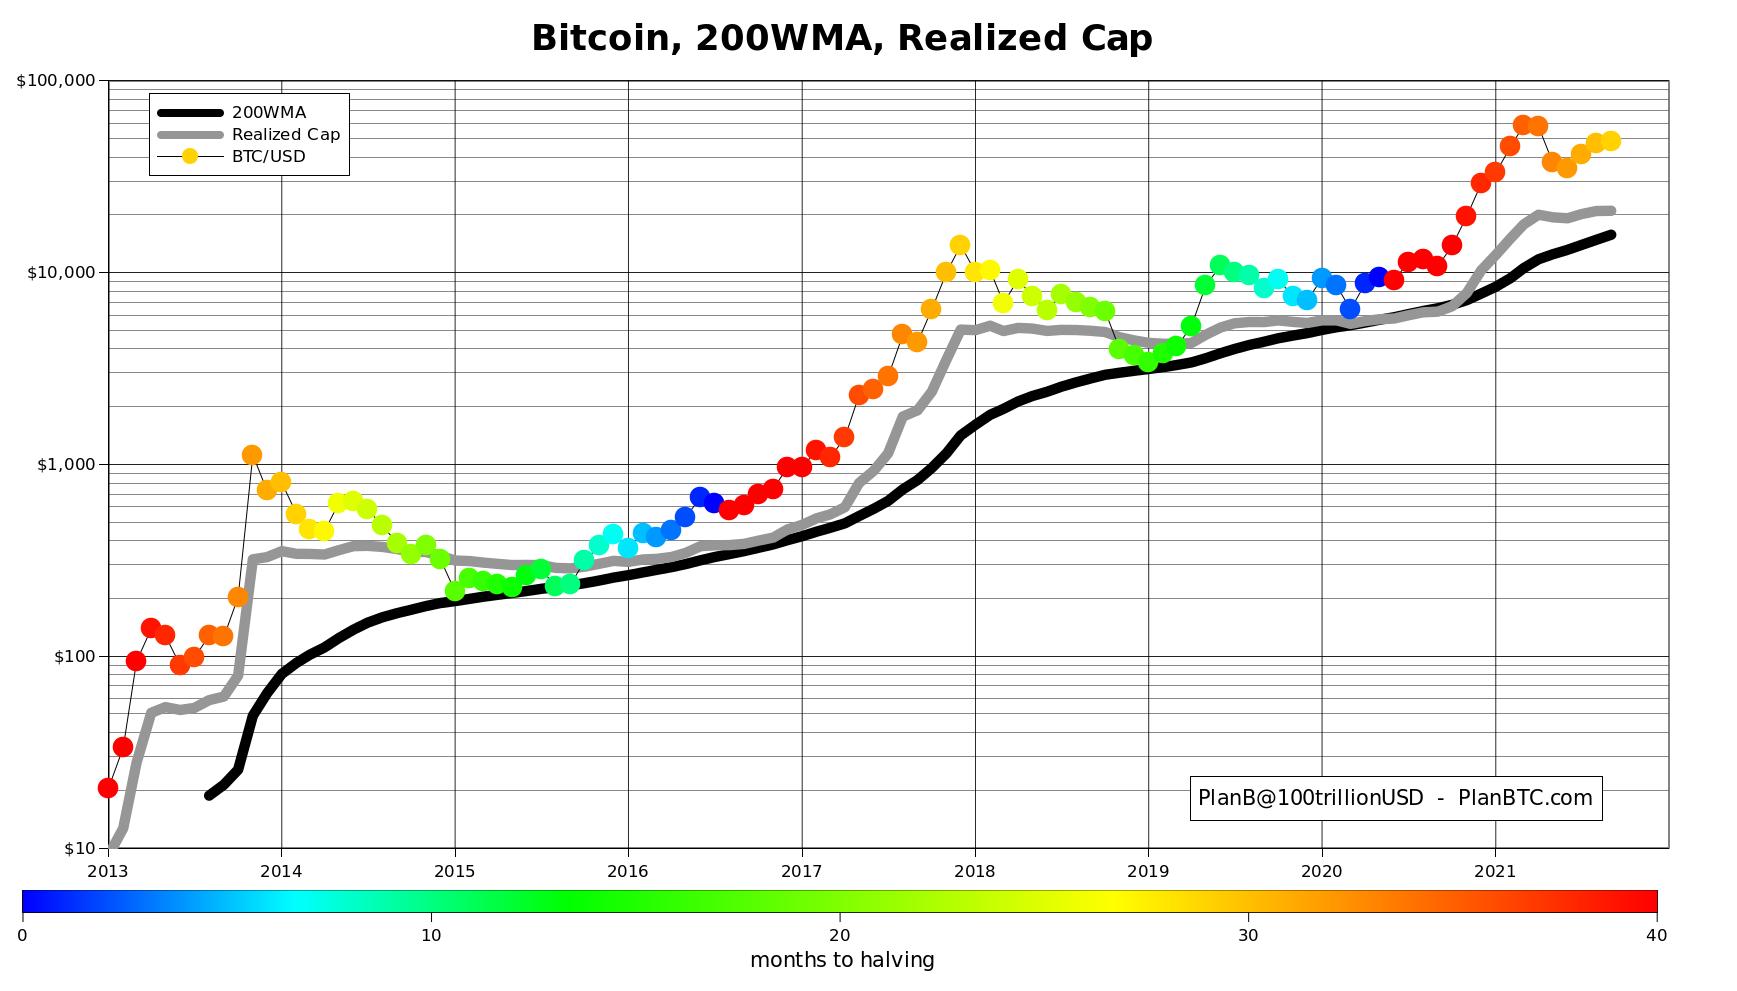 Bitcoin 200WMA vs. Realized Limit